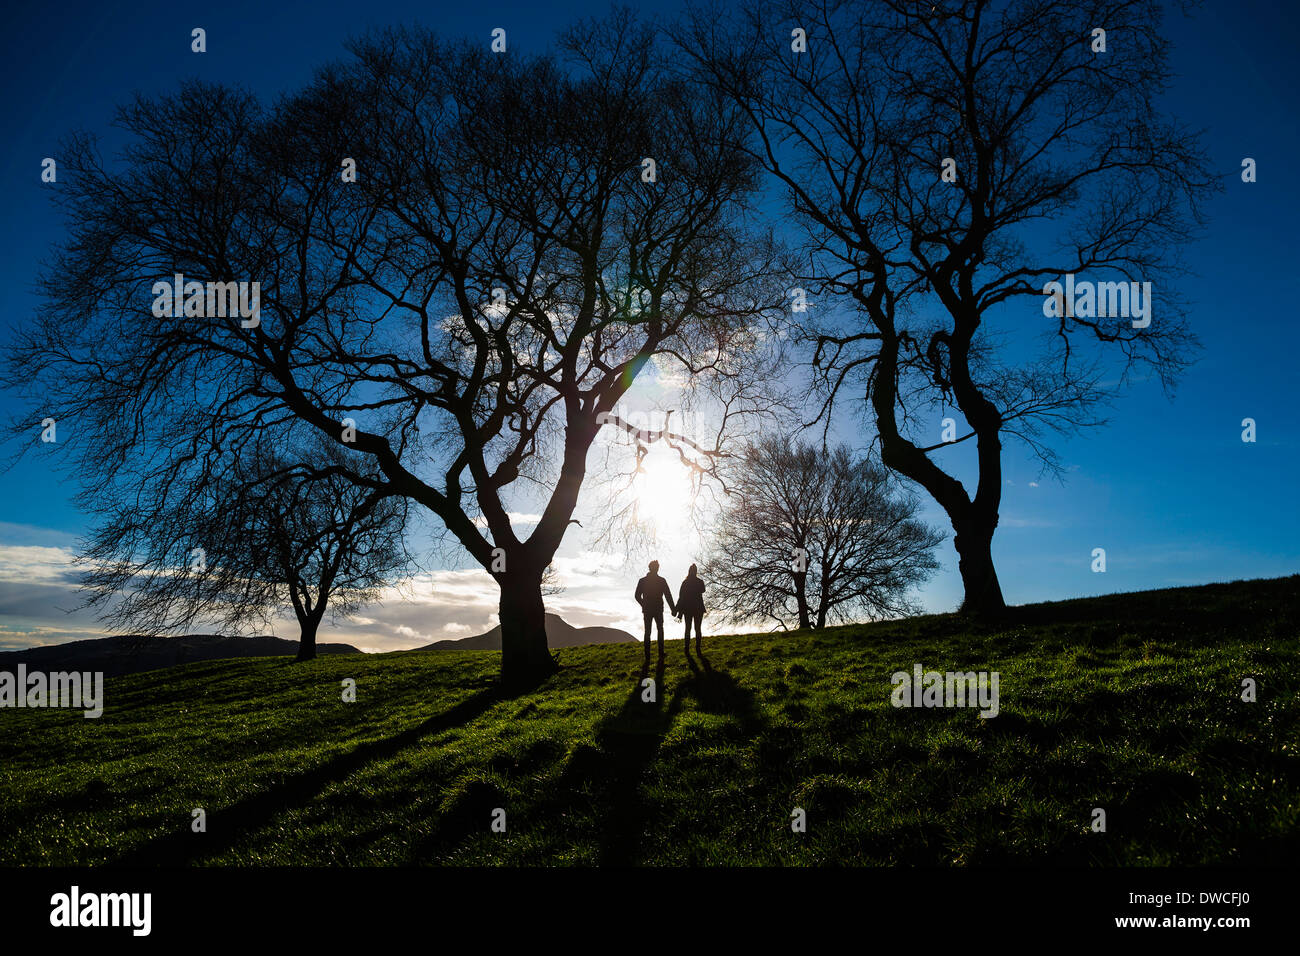 Una joven pareja que mantenga las manos sobre Calton Hill en Edimburgo, capital de Escocia. Imagen De Stock